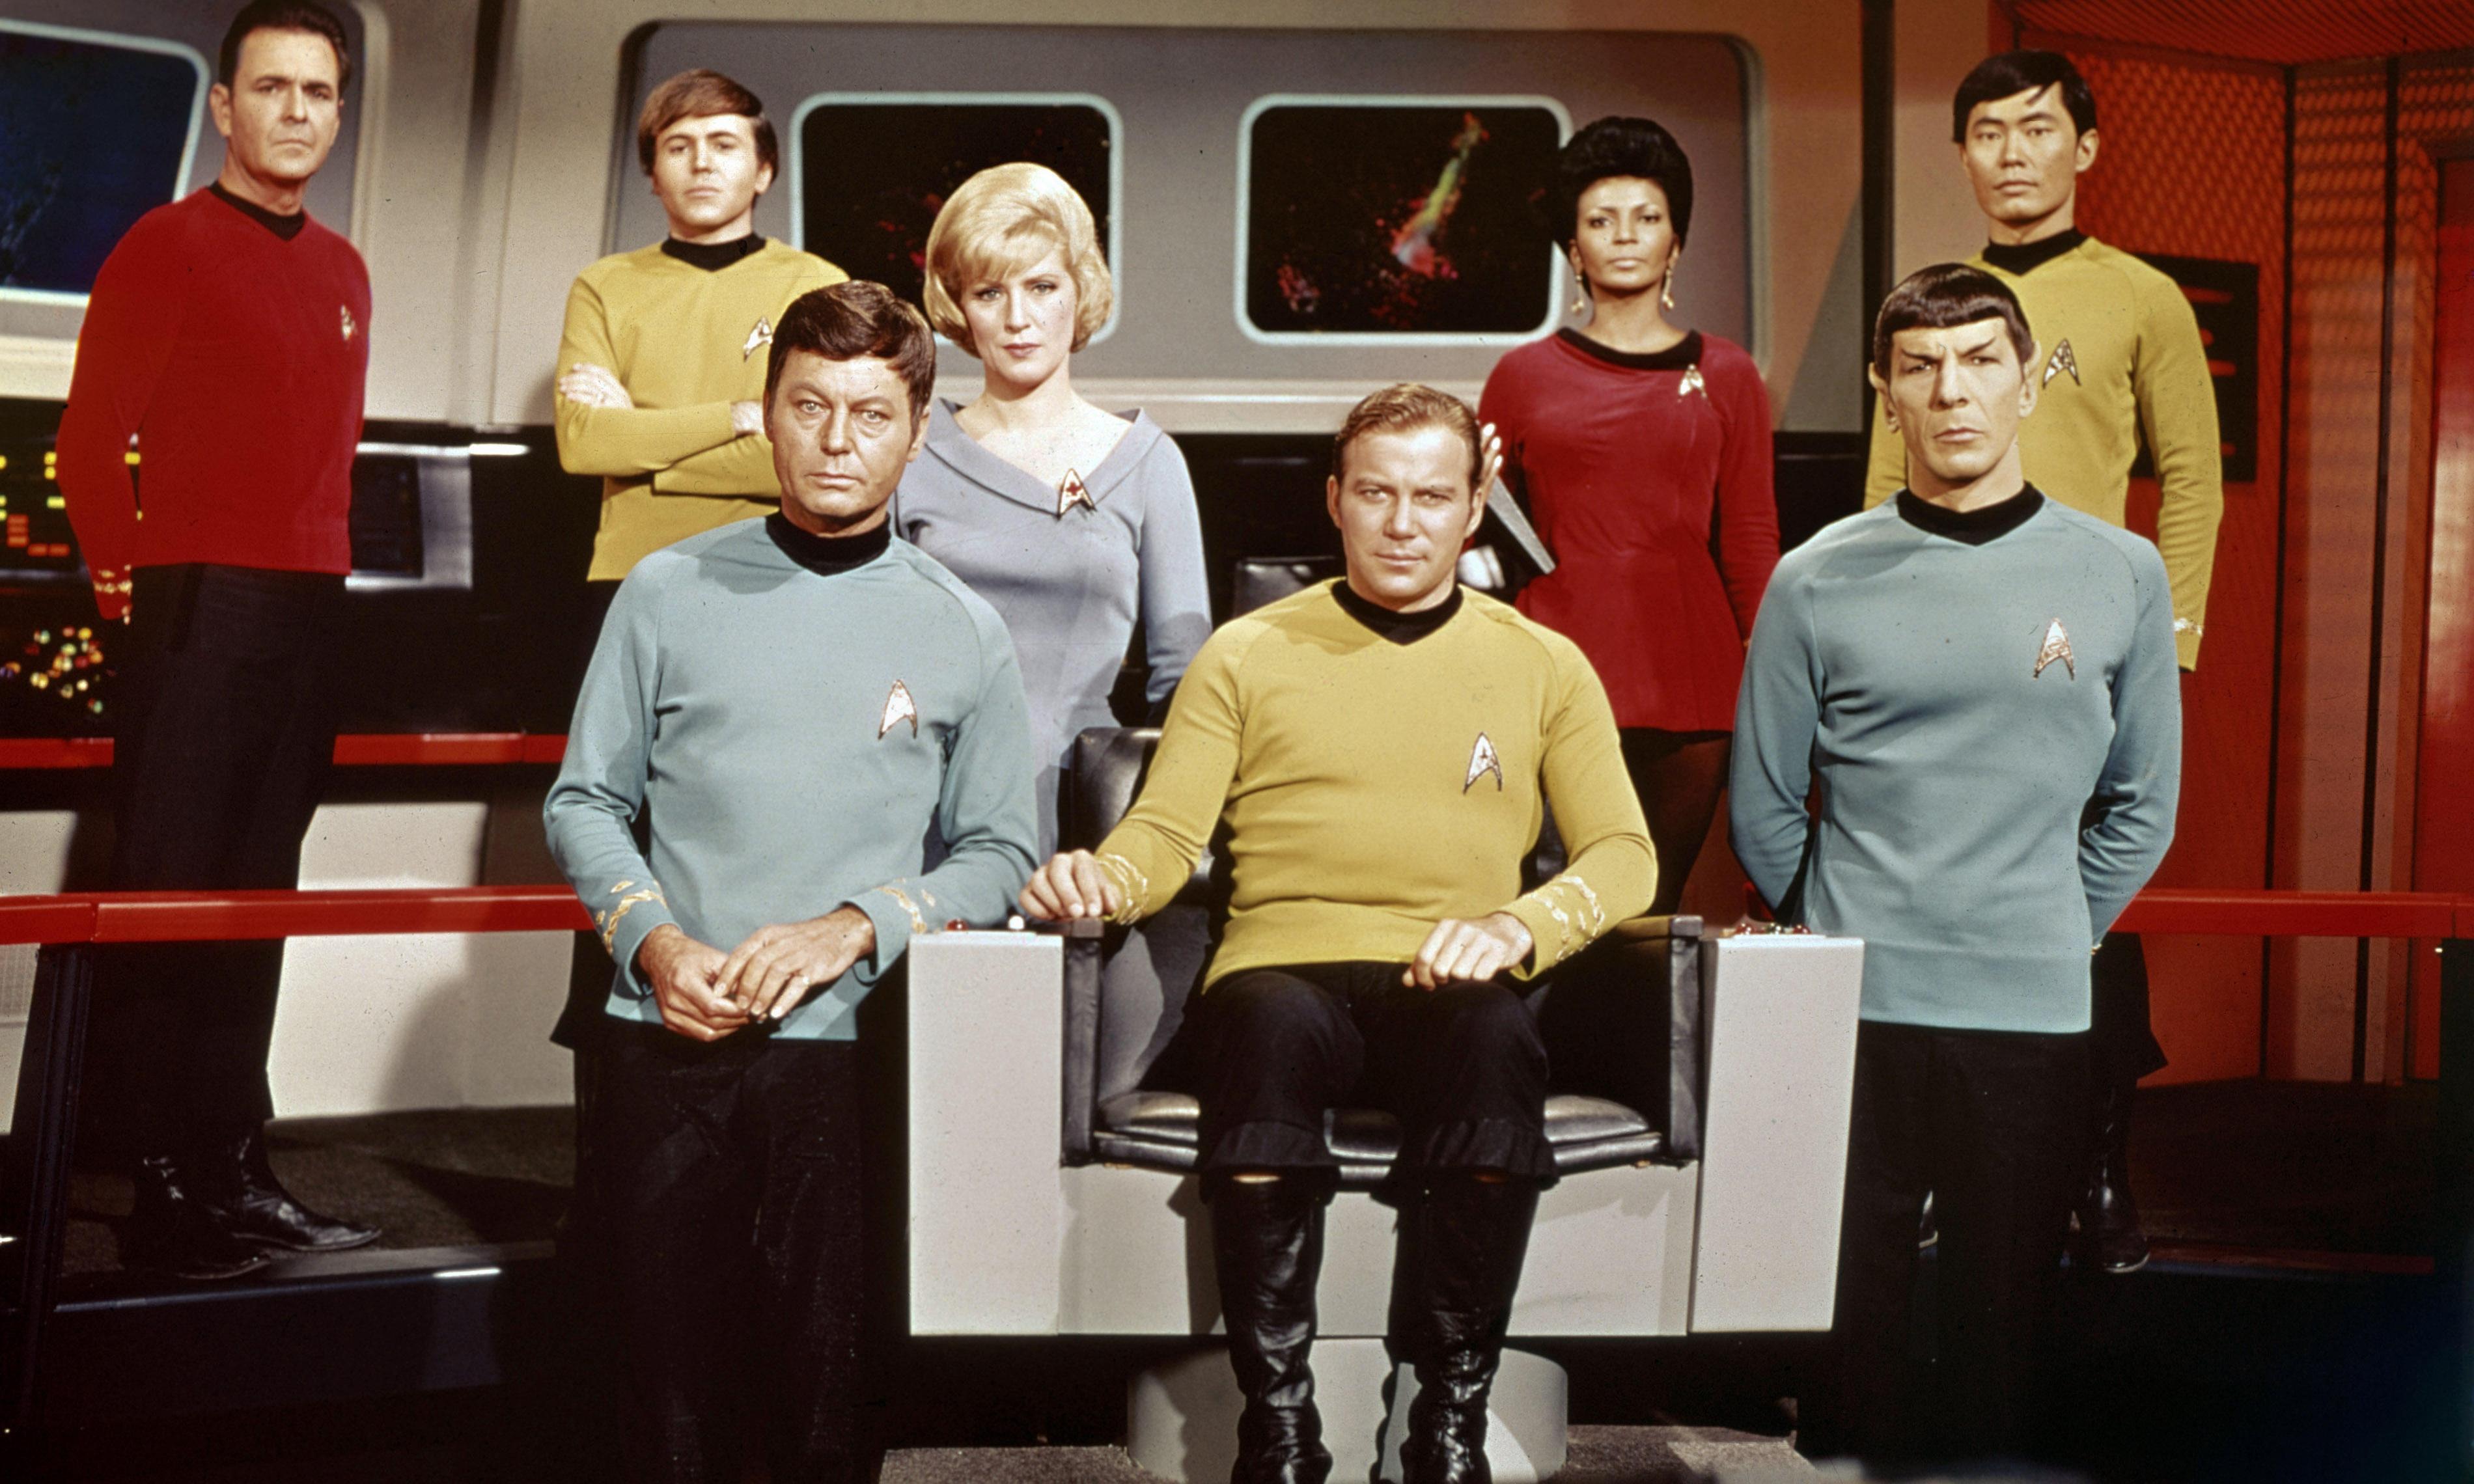 Noah Hawley must boldly go back to Star Trek's origins